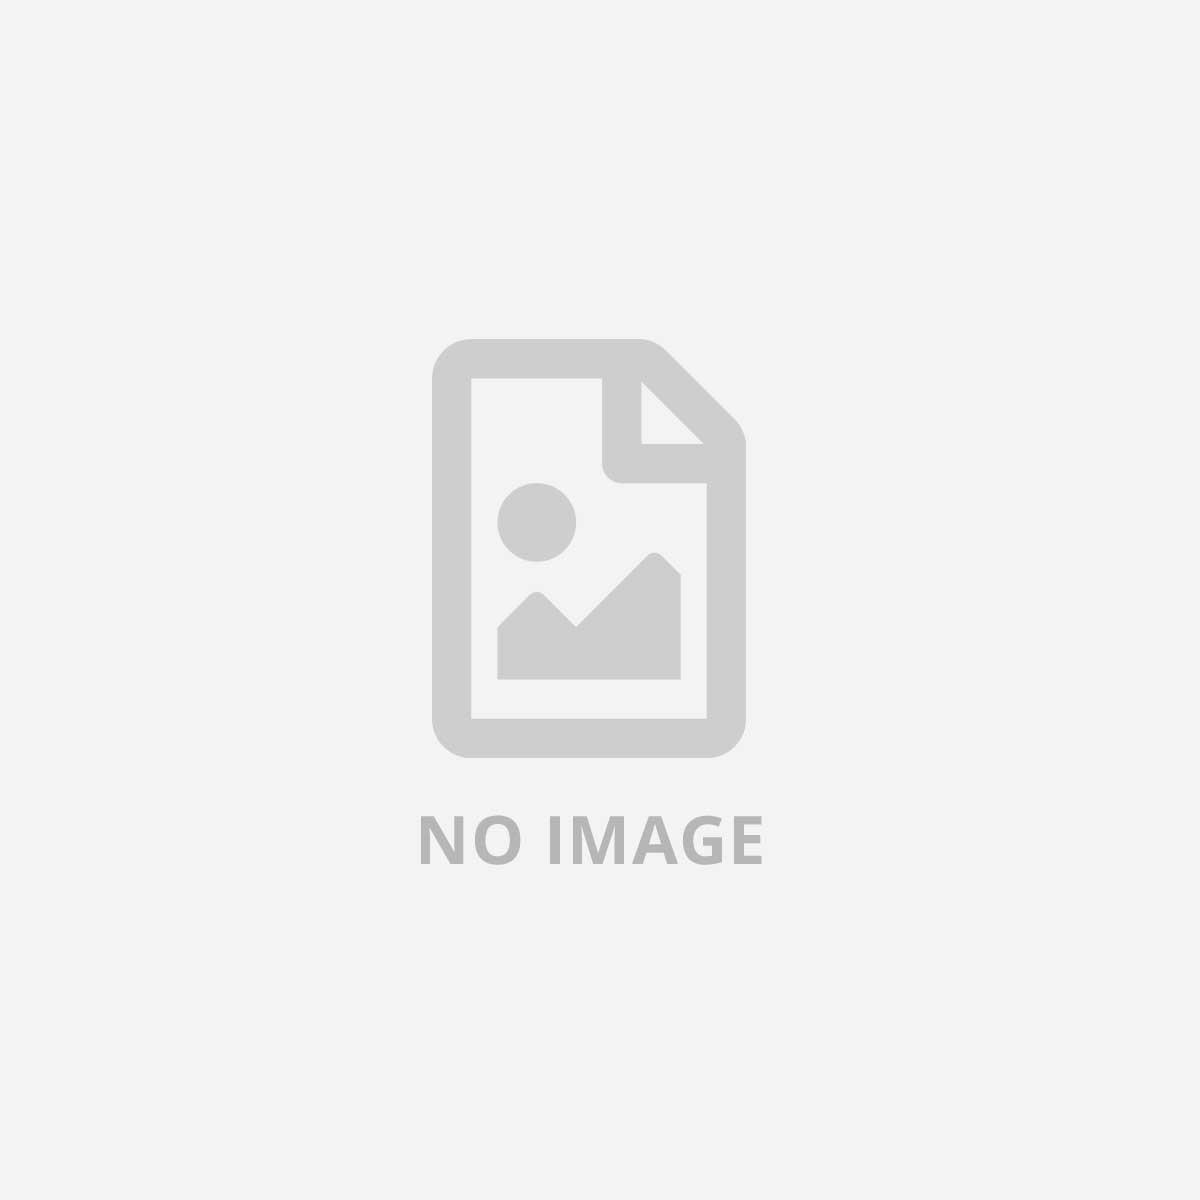 KASPERSKY KAS SECUR X MS OFFICE 365 (250-499)